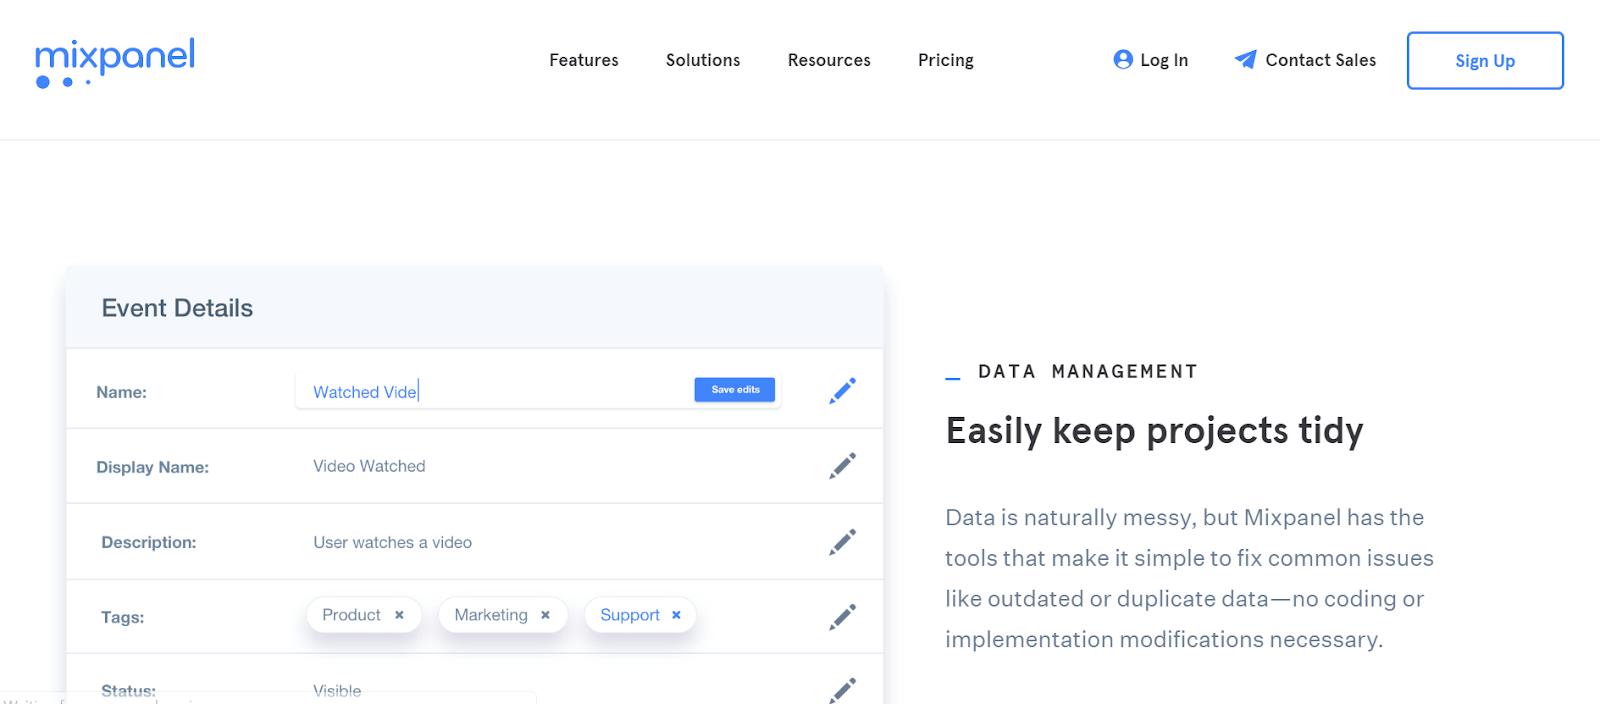 Mixpanel Data Management Tool